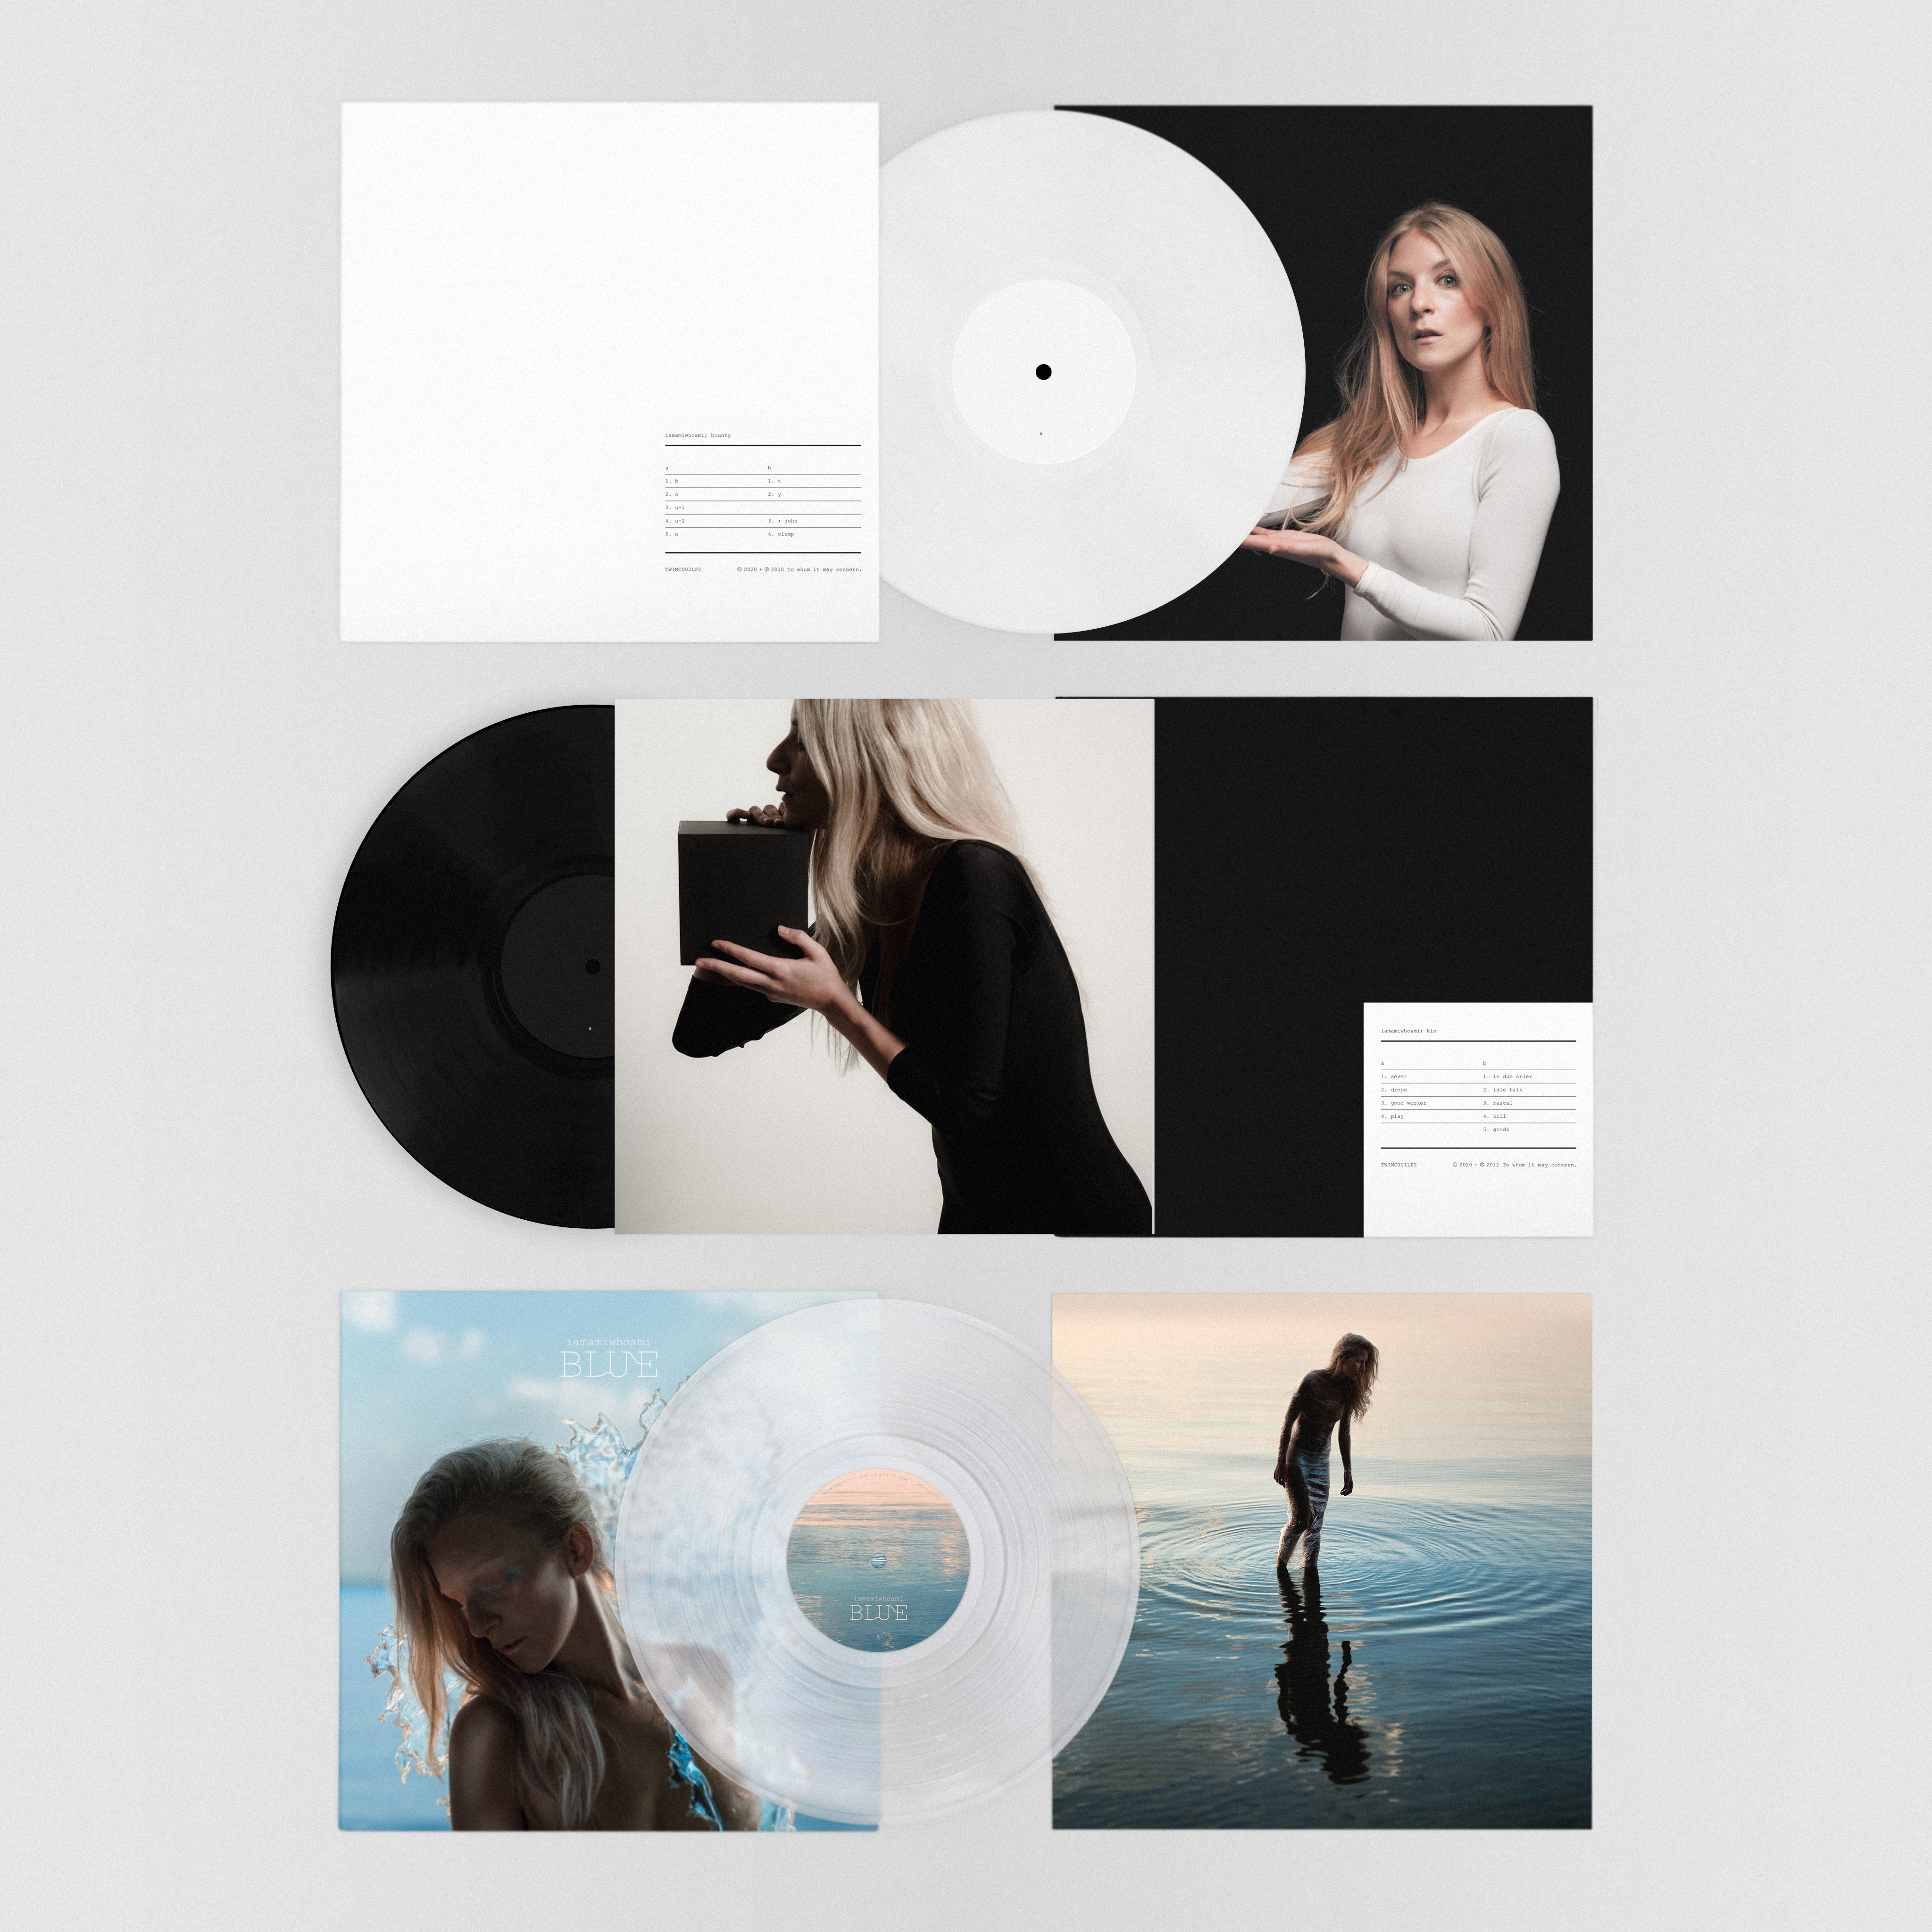 iamamiwhoami; LP collection